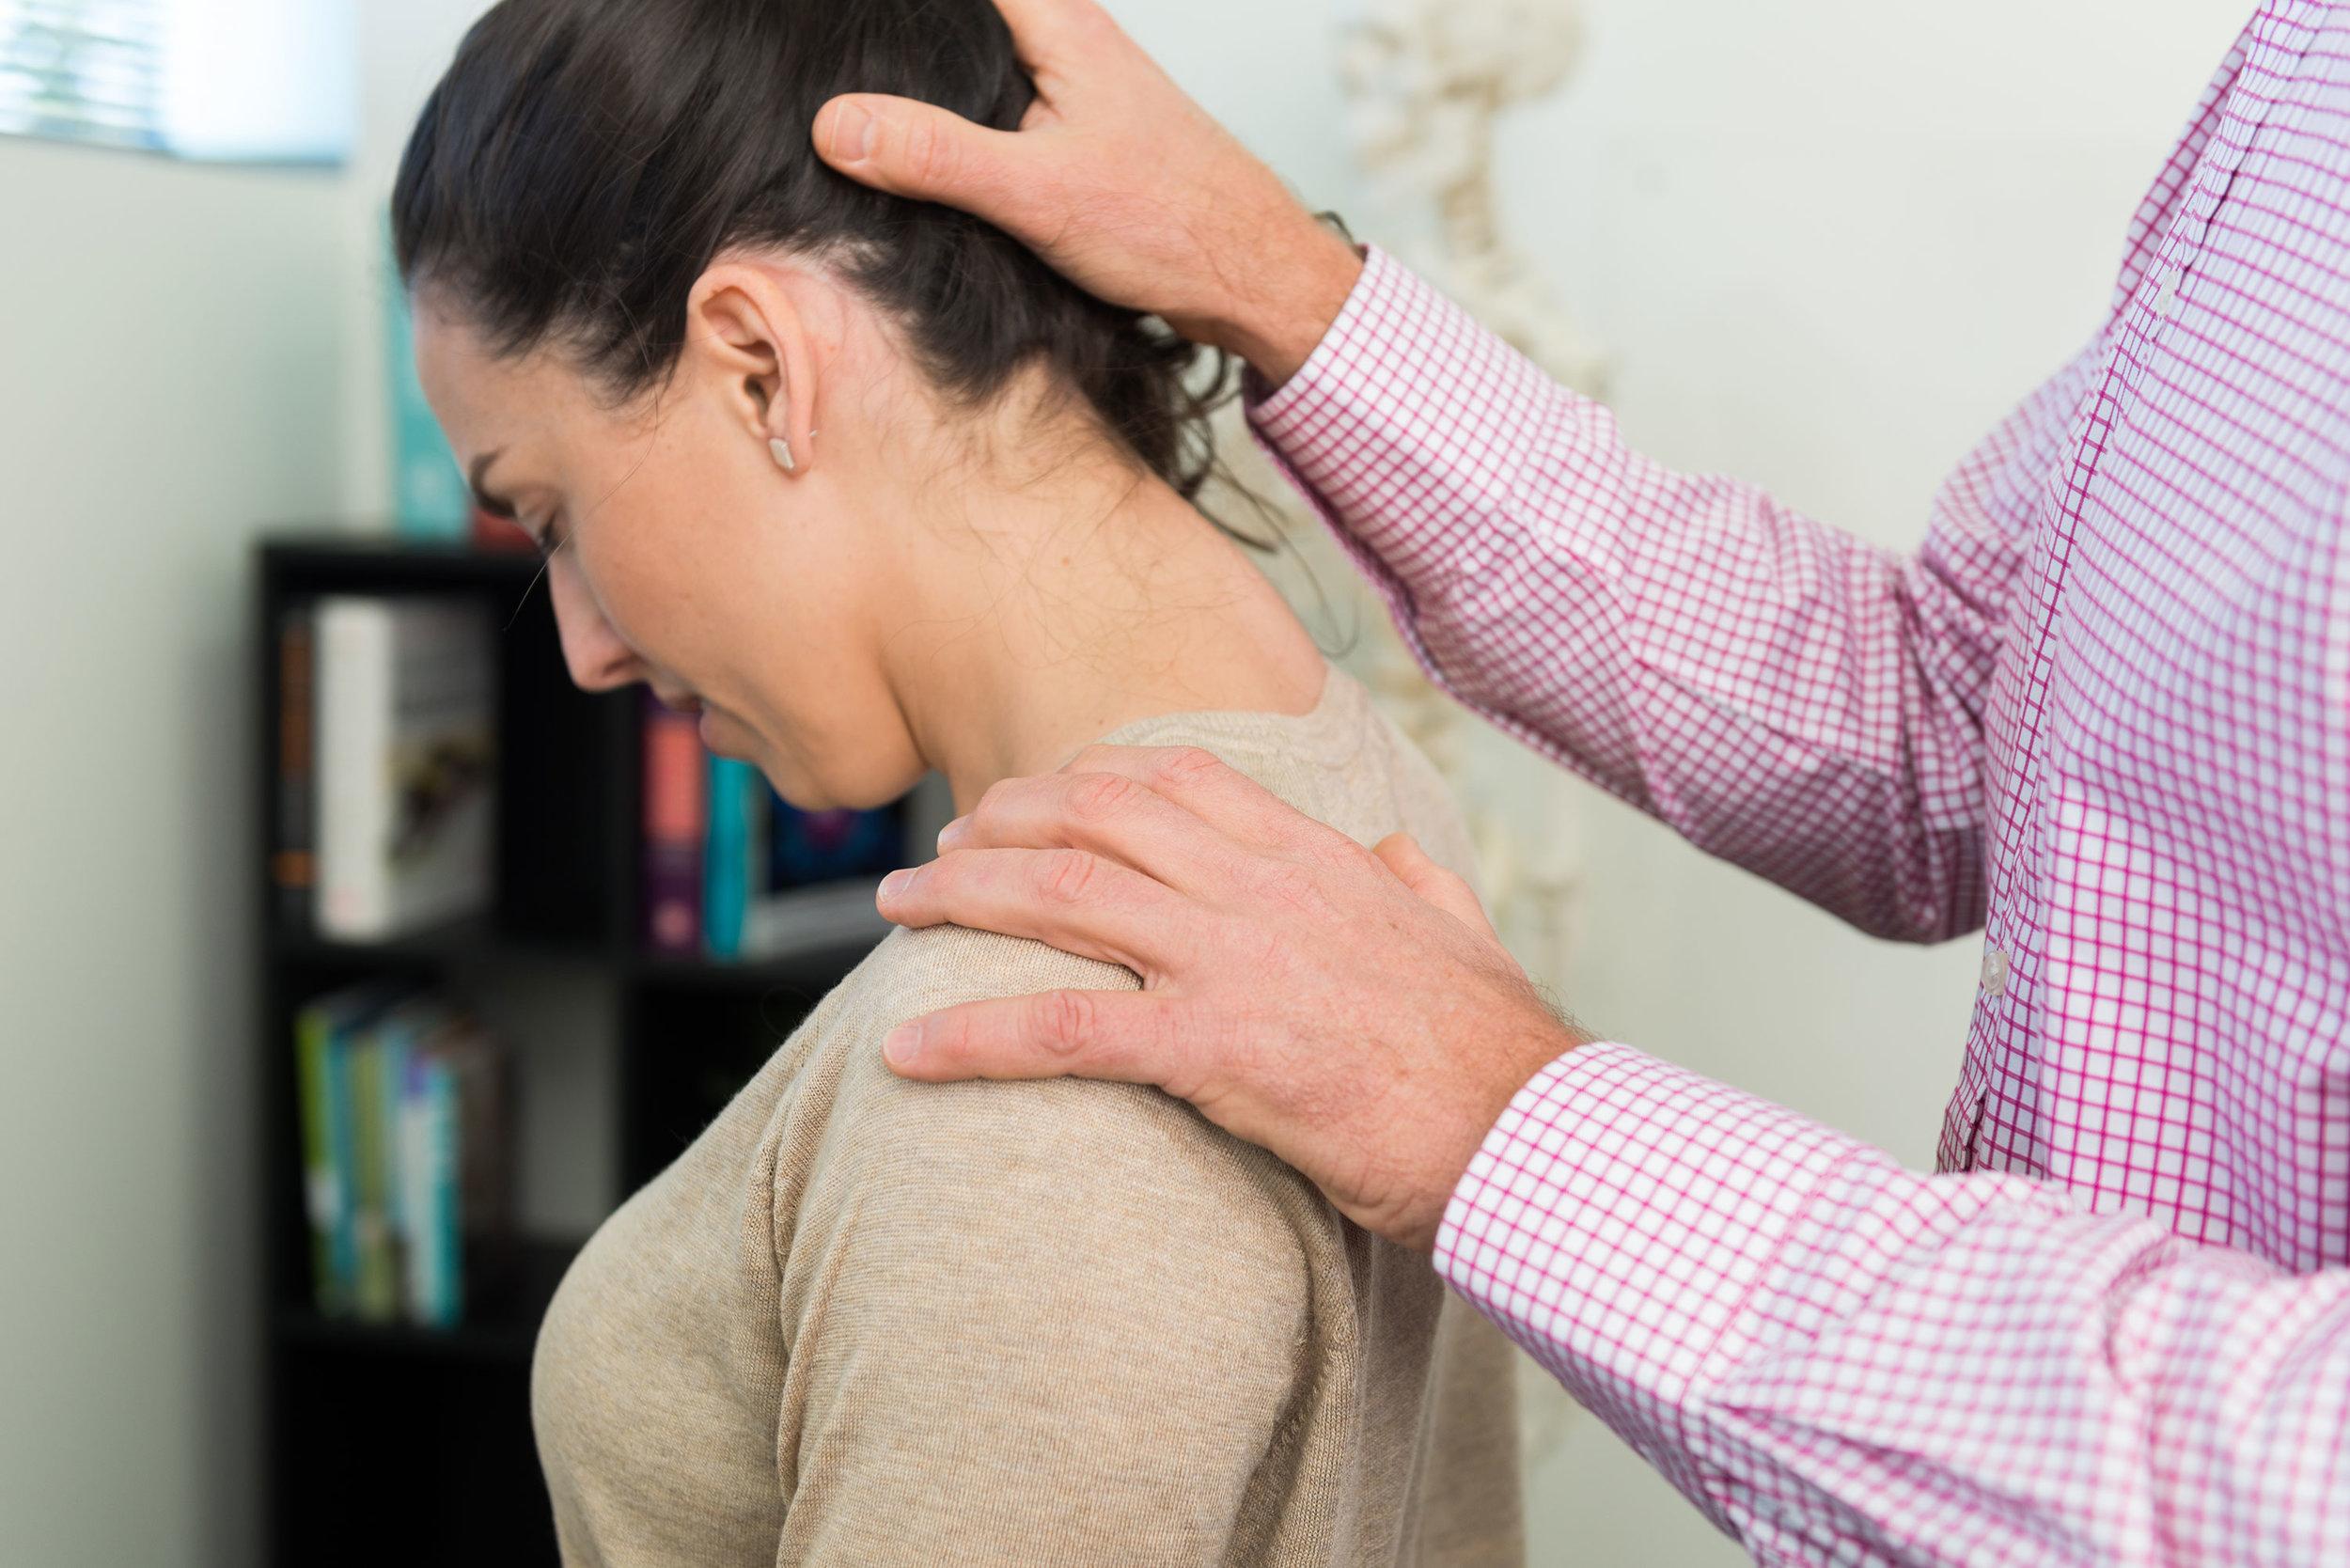 MSK-MEDICINE-TREATMENT–Gentle-Manual-Therapies-Dr-Chris-Homan